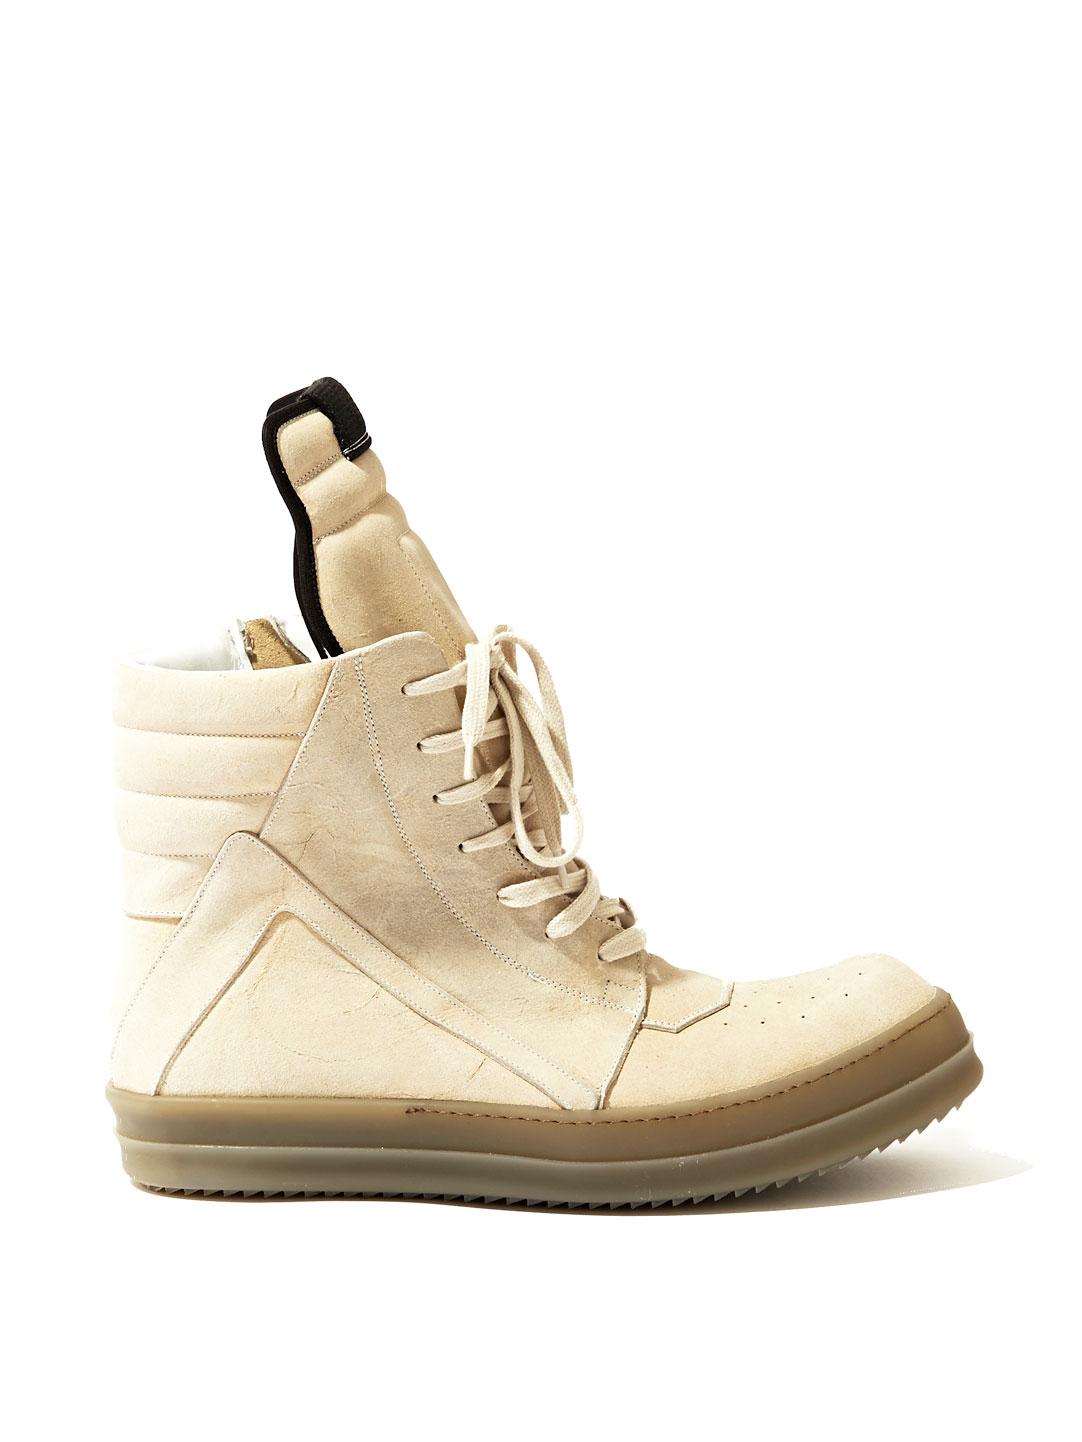 Rubber Rings For Men >> Rick Owens Mens Suede Geobasket Sneakers in Beige for Men (Neutral) | Lyst